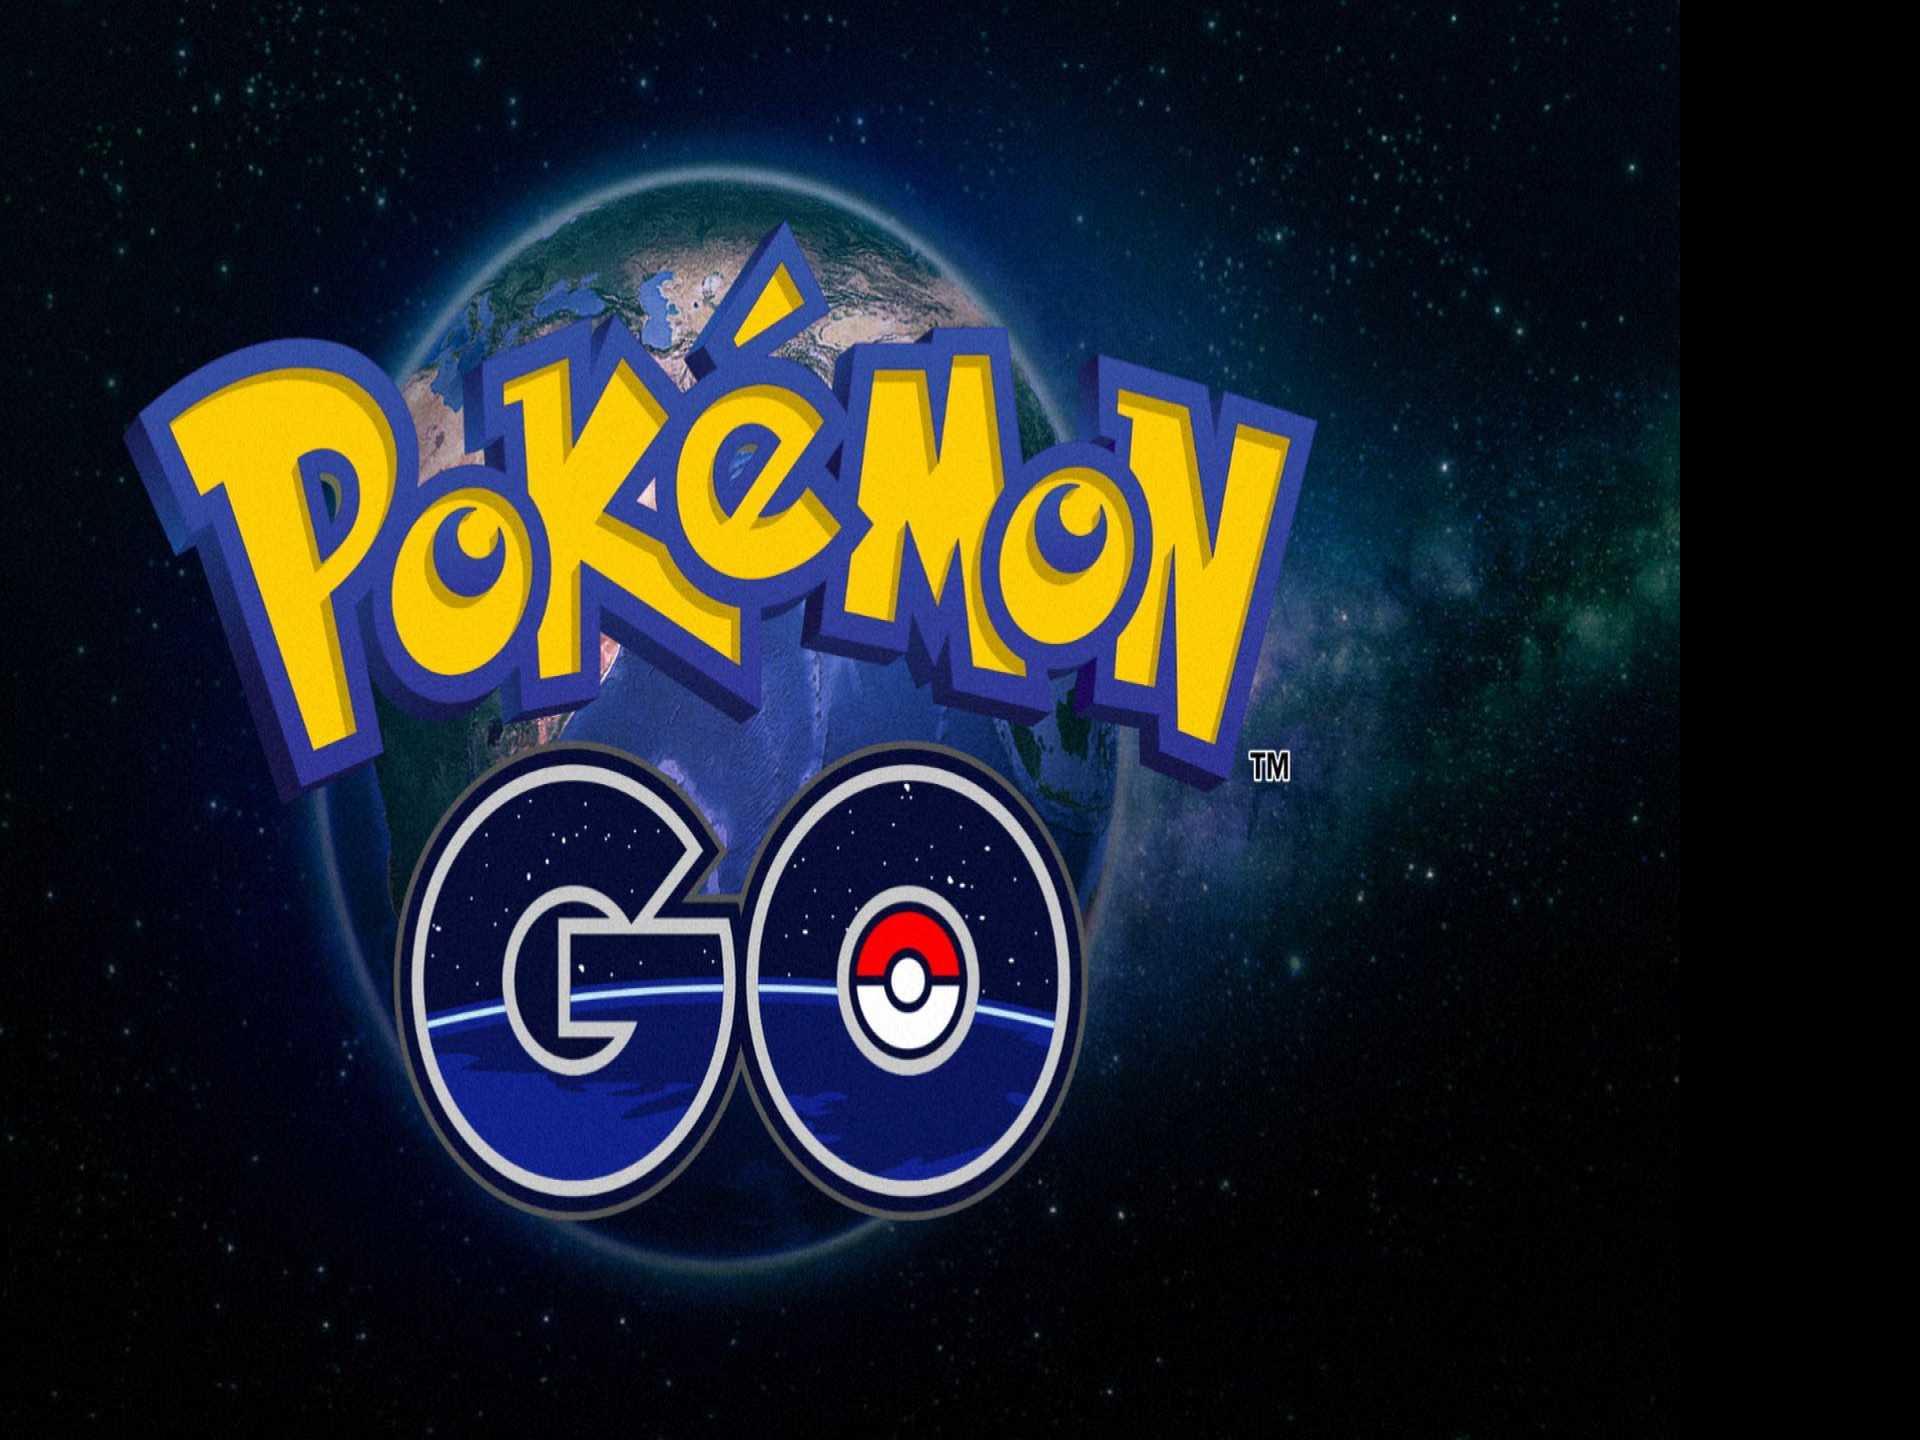 Chicago Festival to Mark Pokemon Go Anniversary Goes Awry